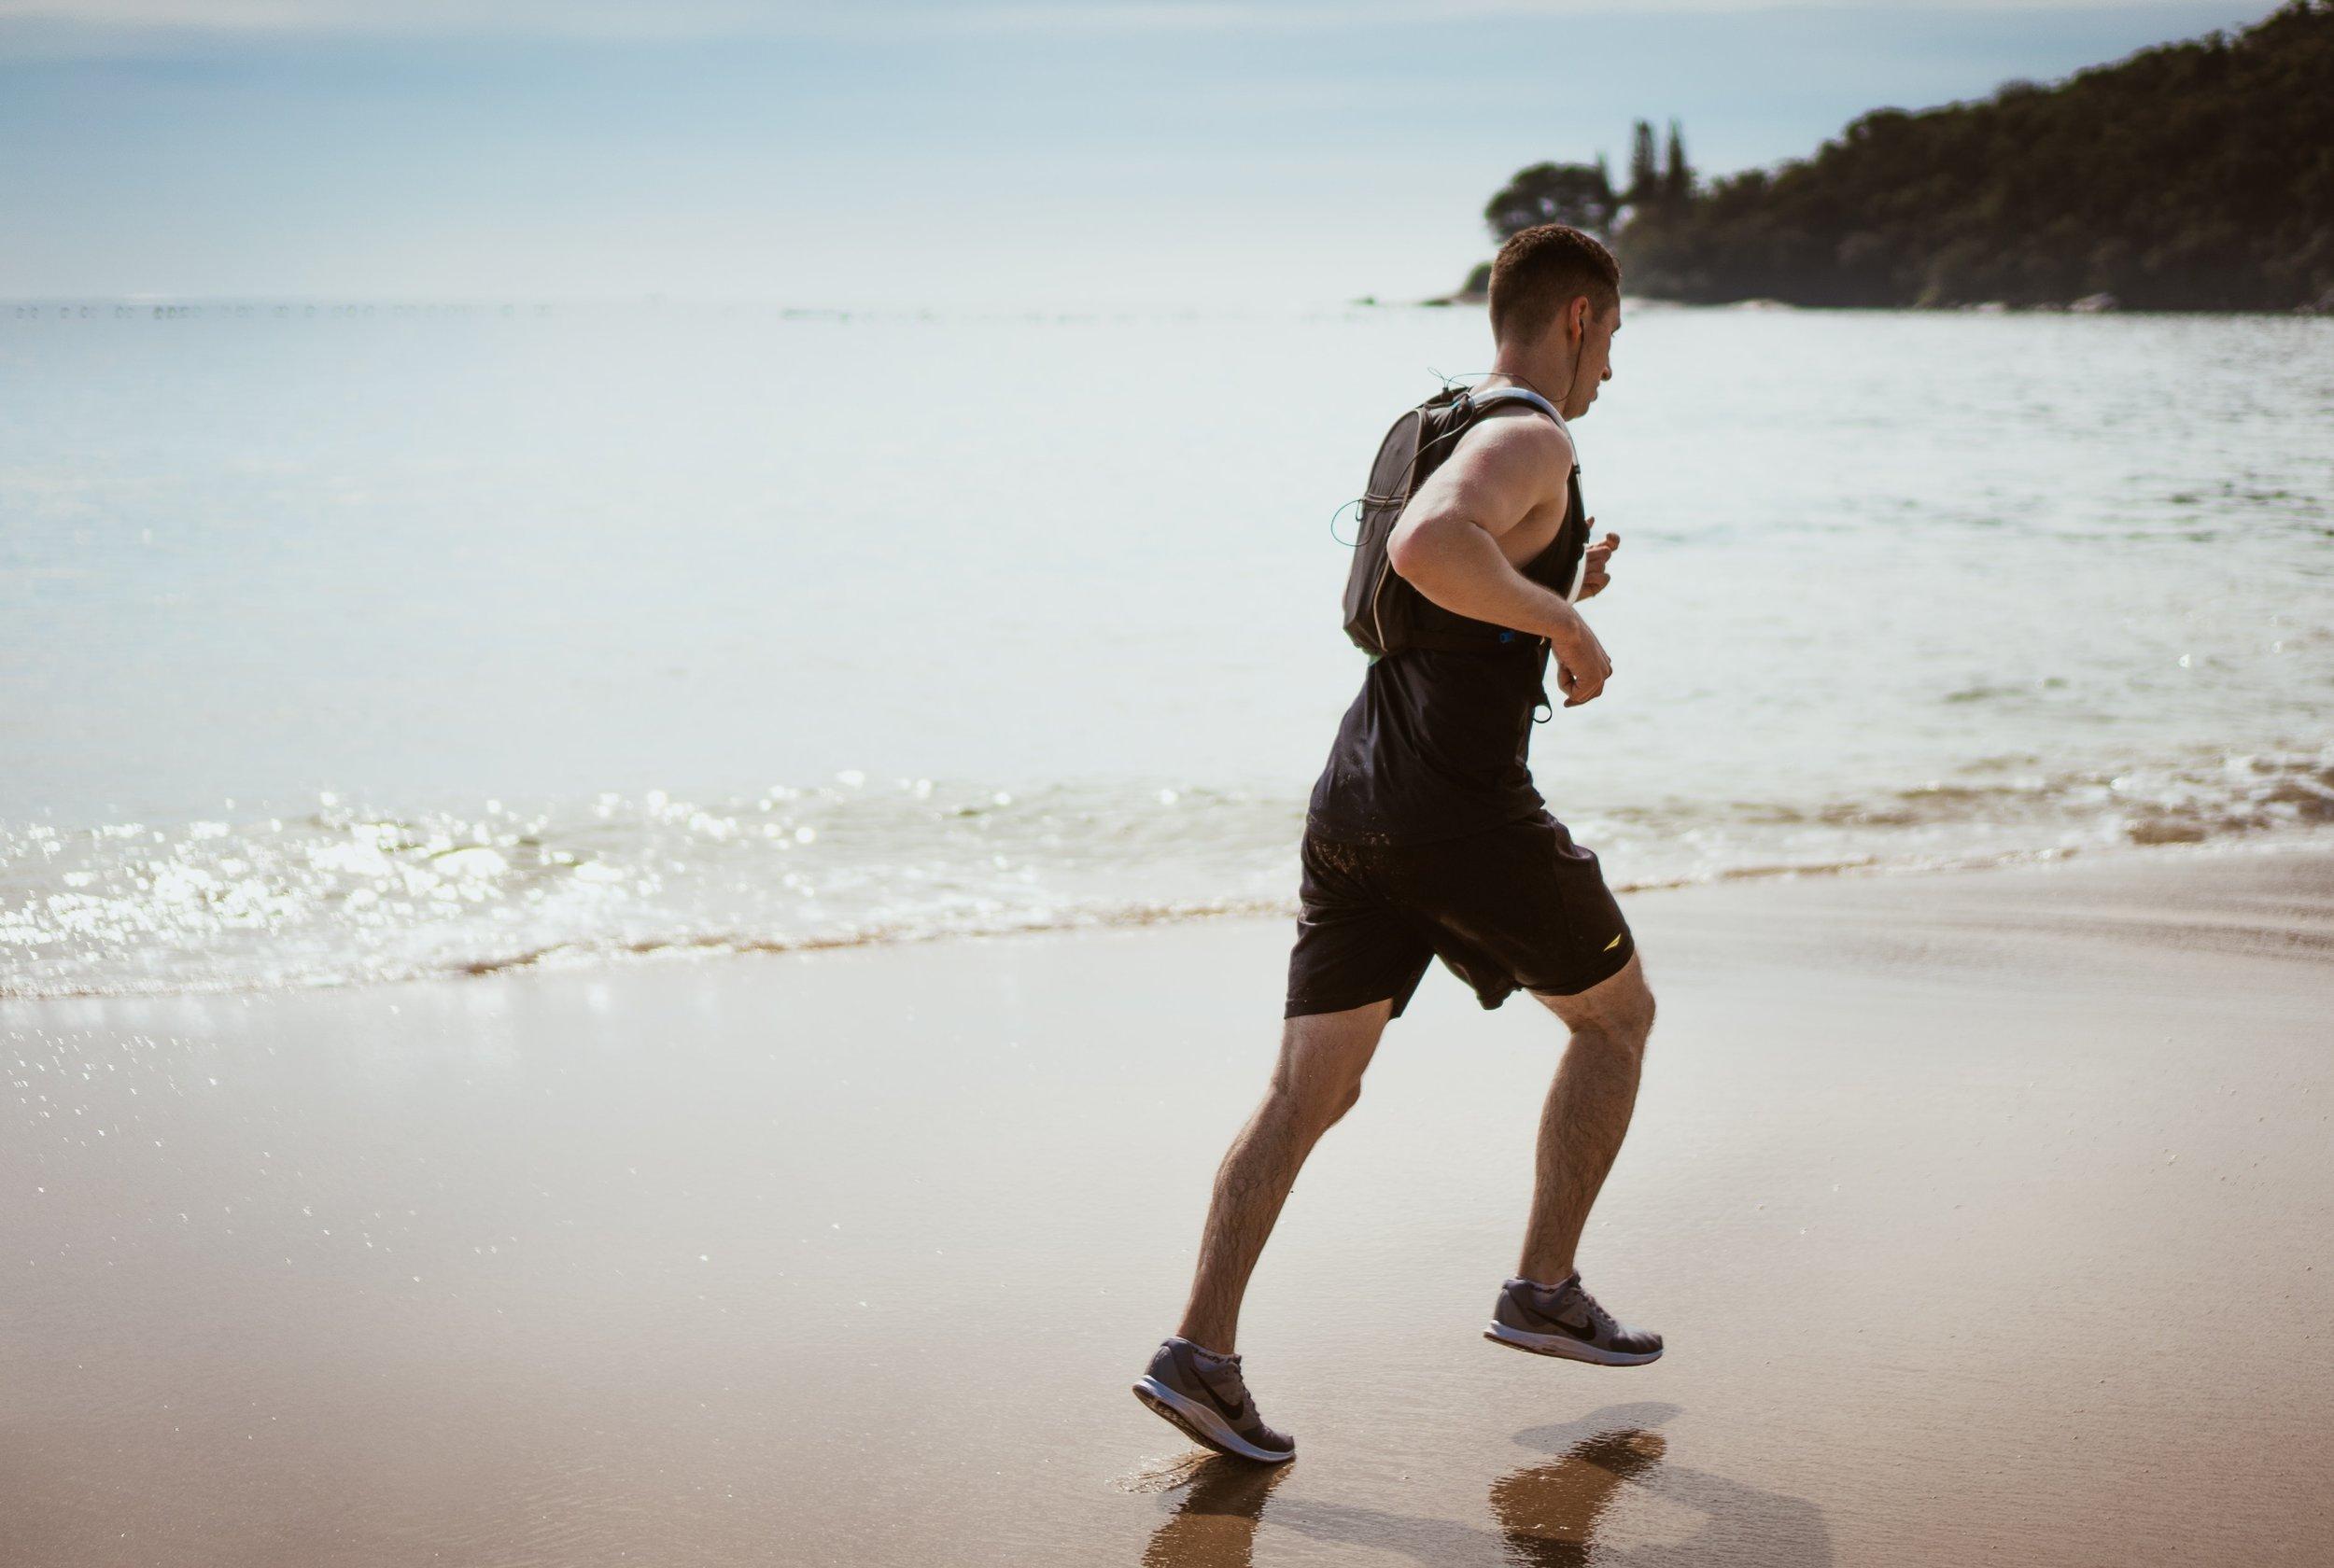 beach-enjoyment-exercise-1390403.jpg